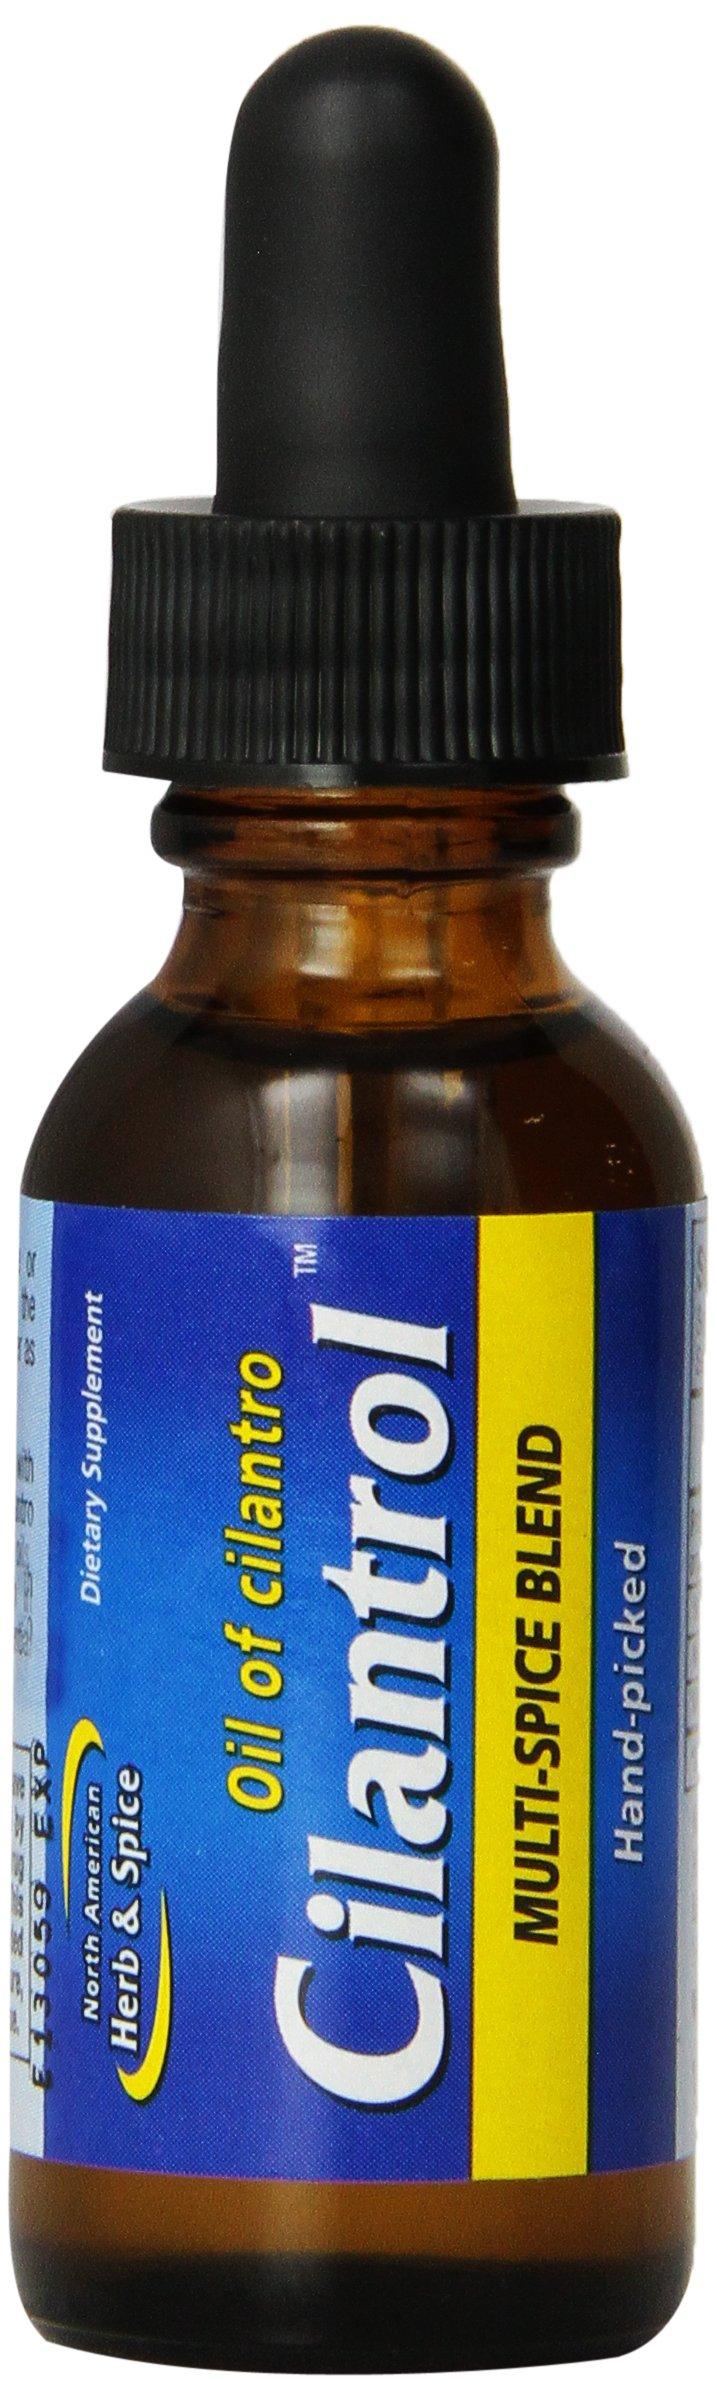 North American Herb and Spice, Cilantrol, Oil of Cilantro, Multi-spice Blend, 1-Ounce